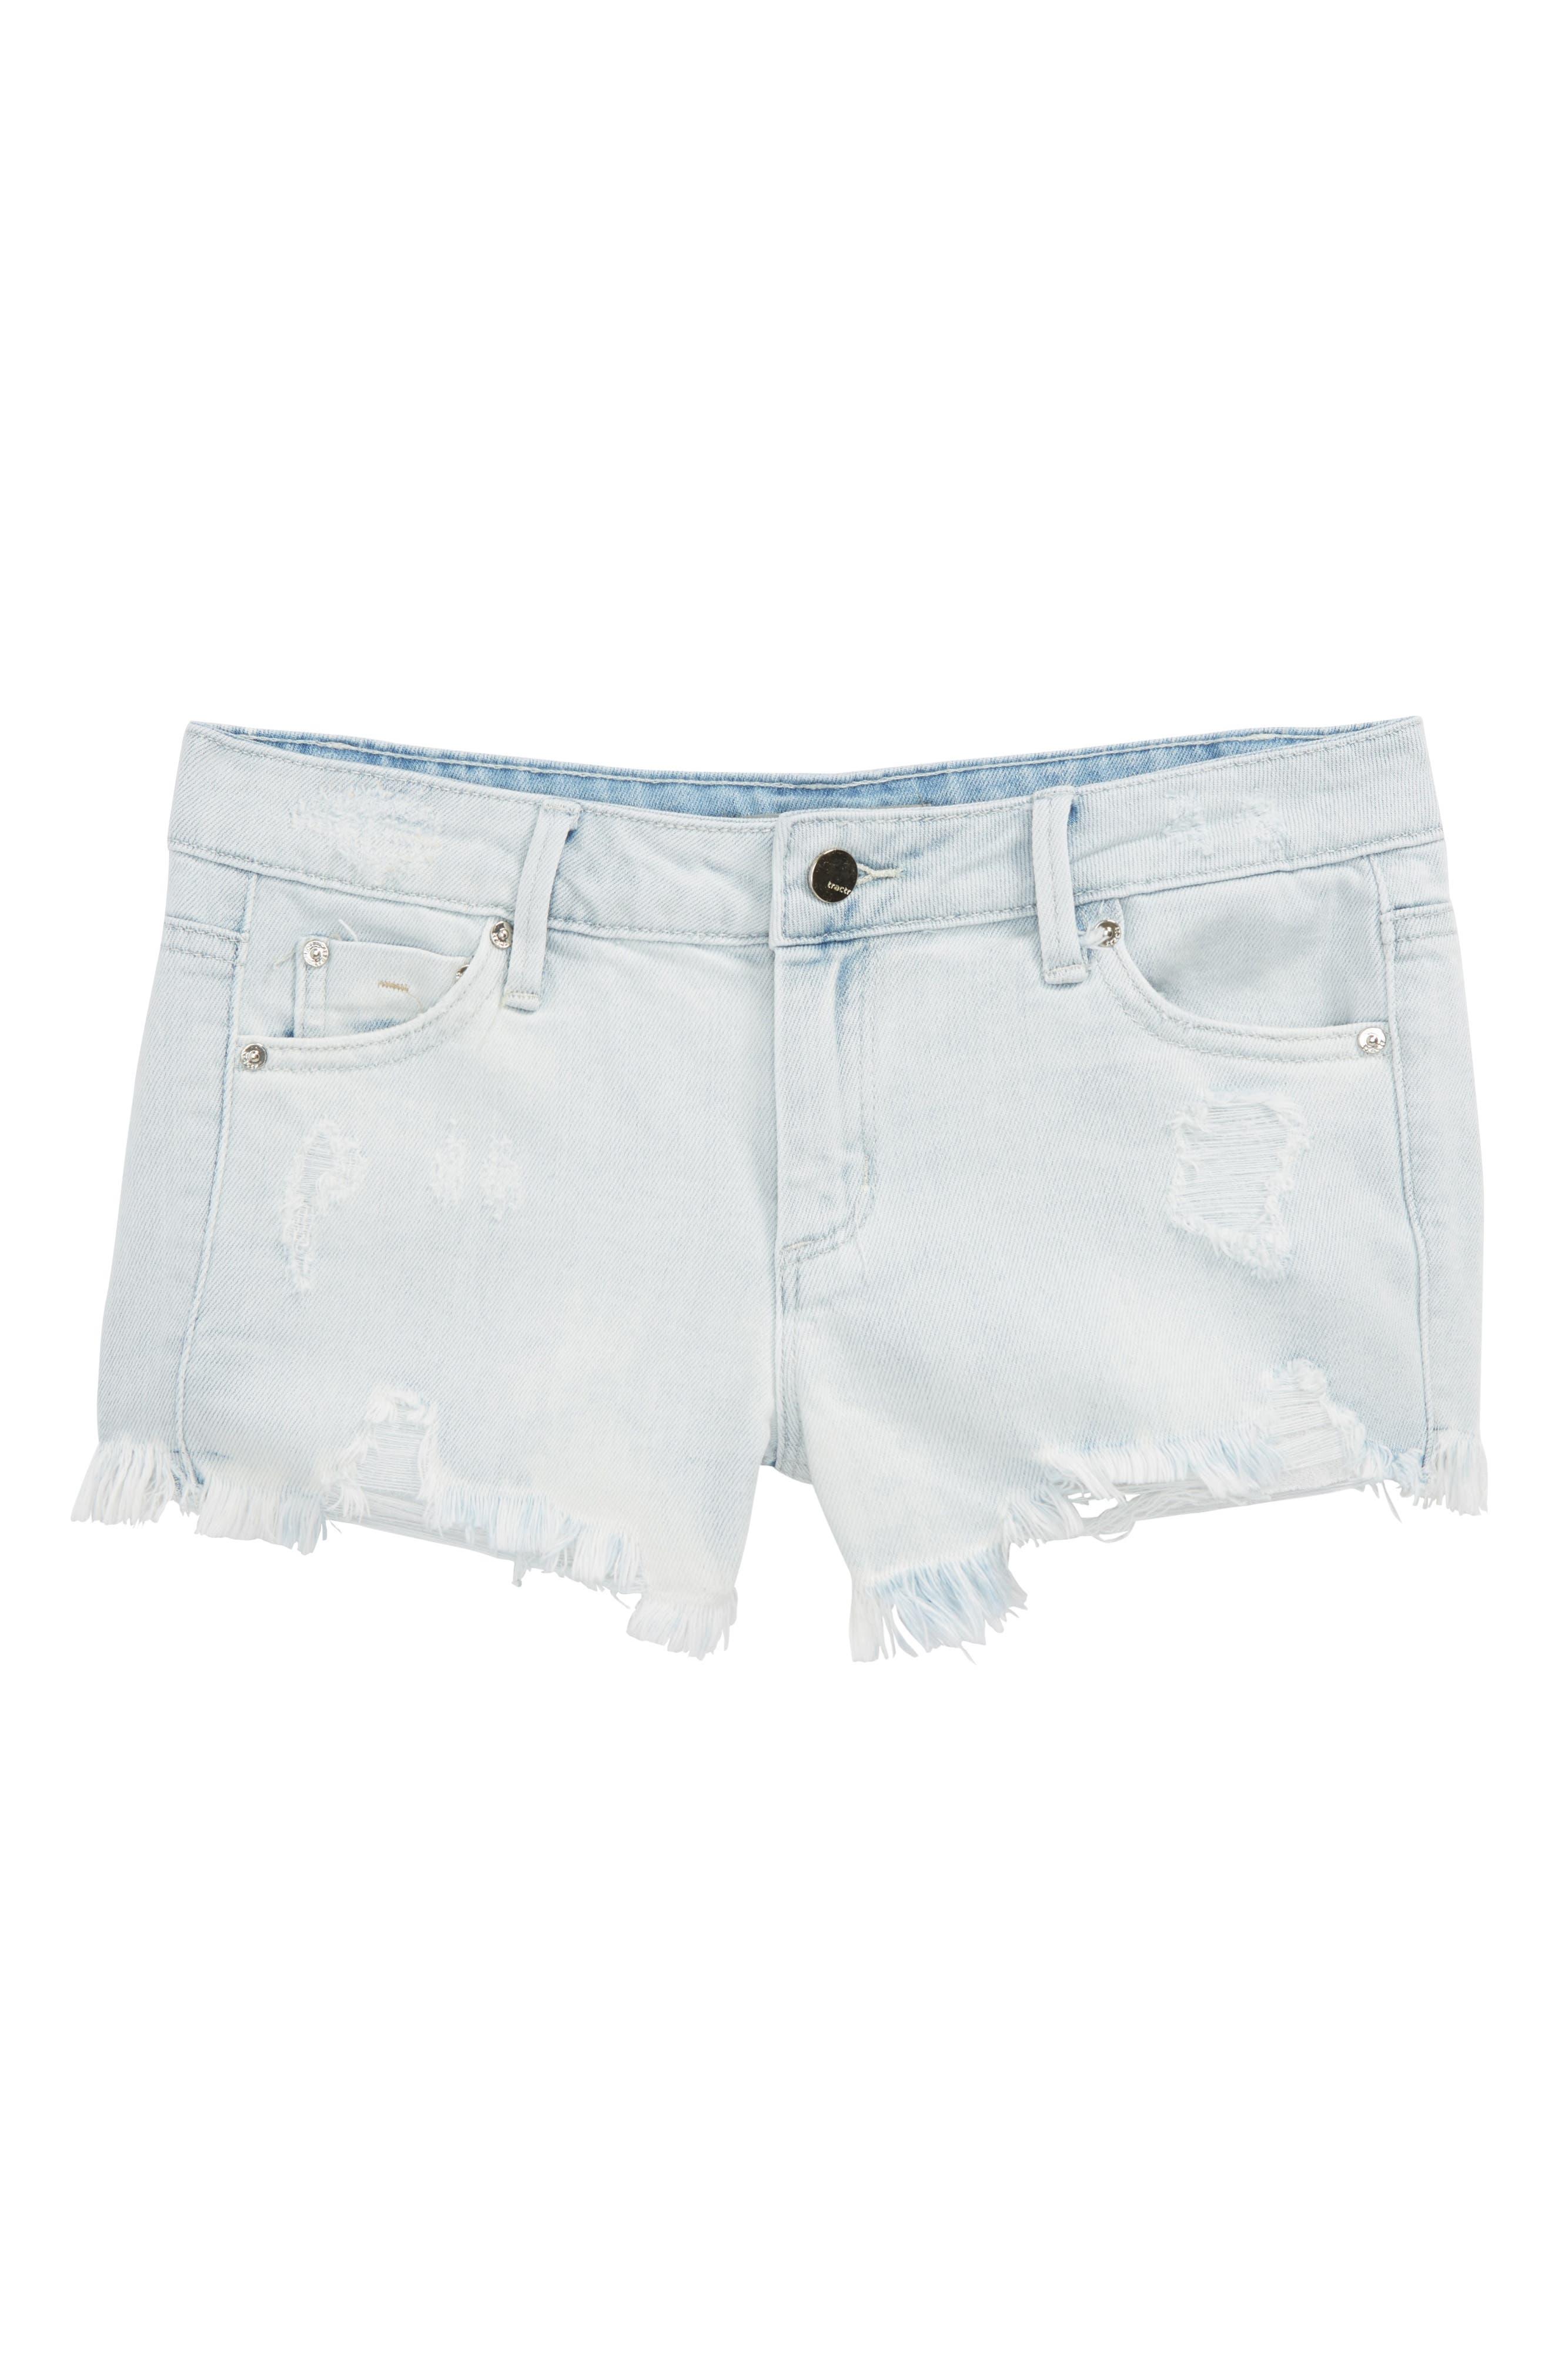 Destructed Frayed Denim Shorts,                         Main,                         color, Light Indigo